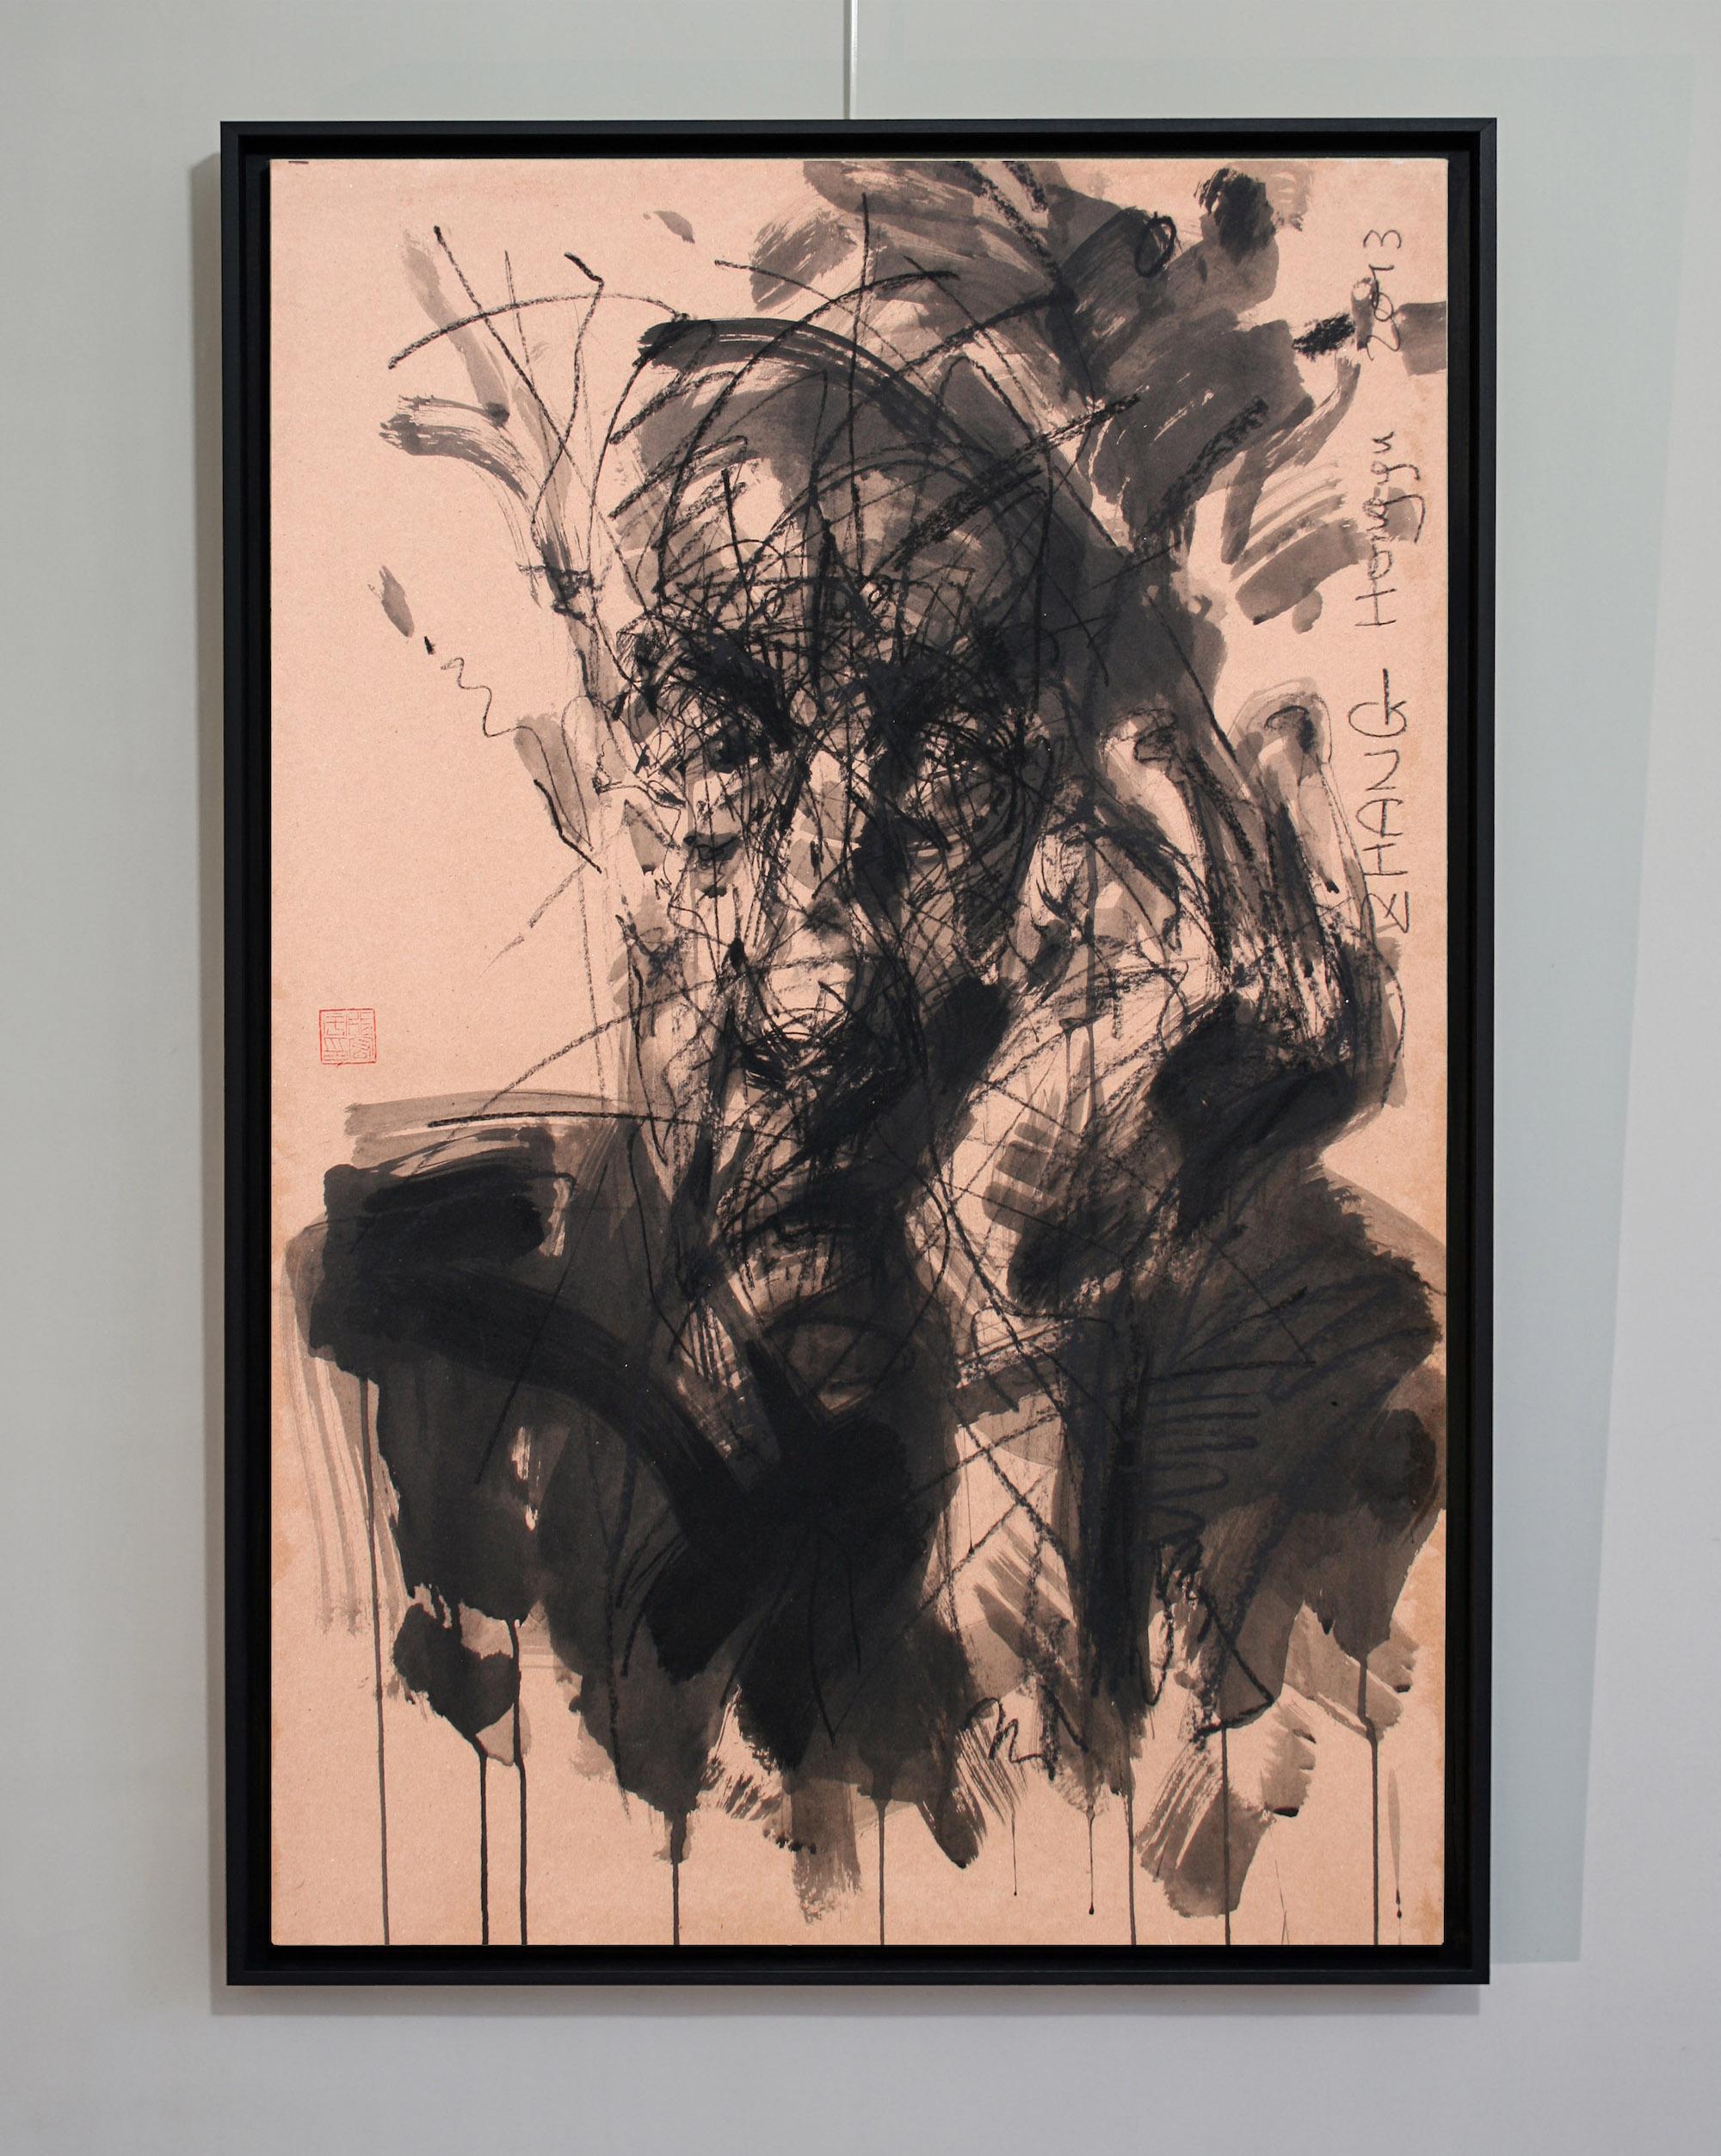 No. 178 (contemporary portrait painting)